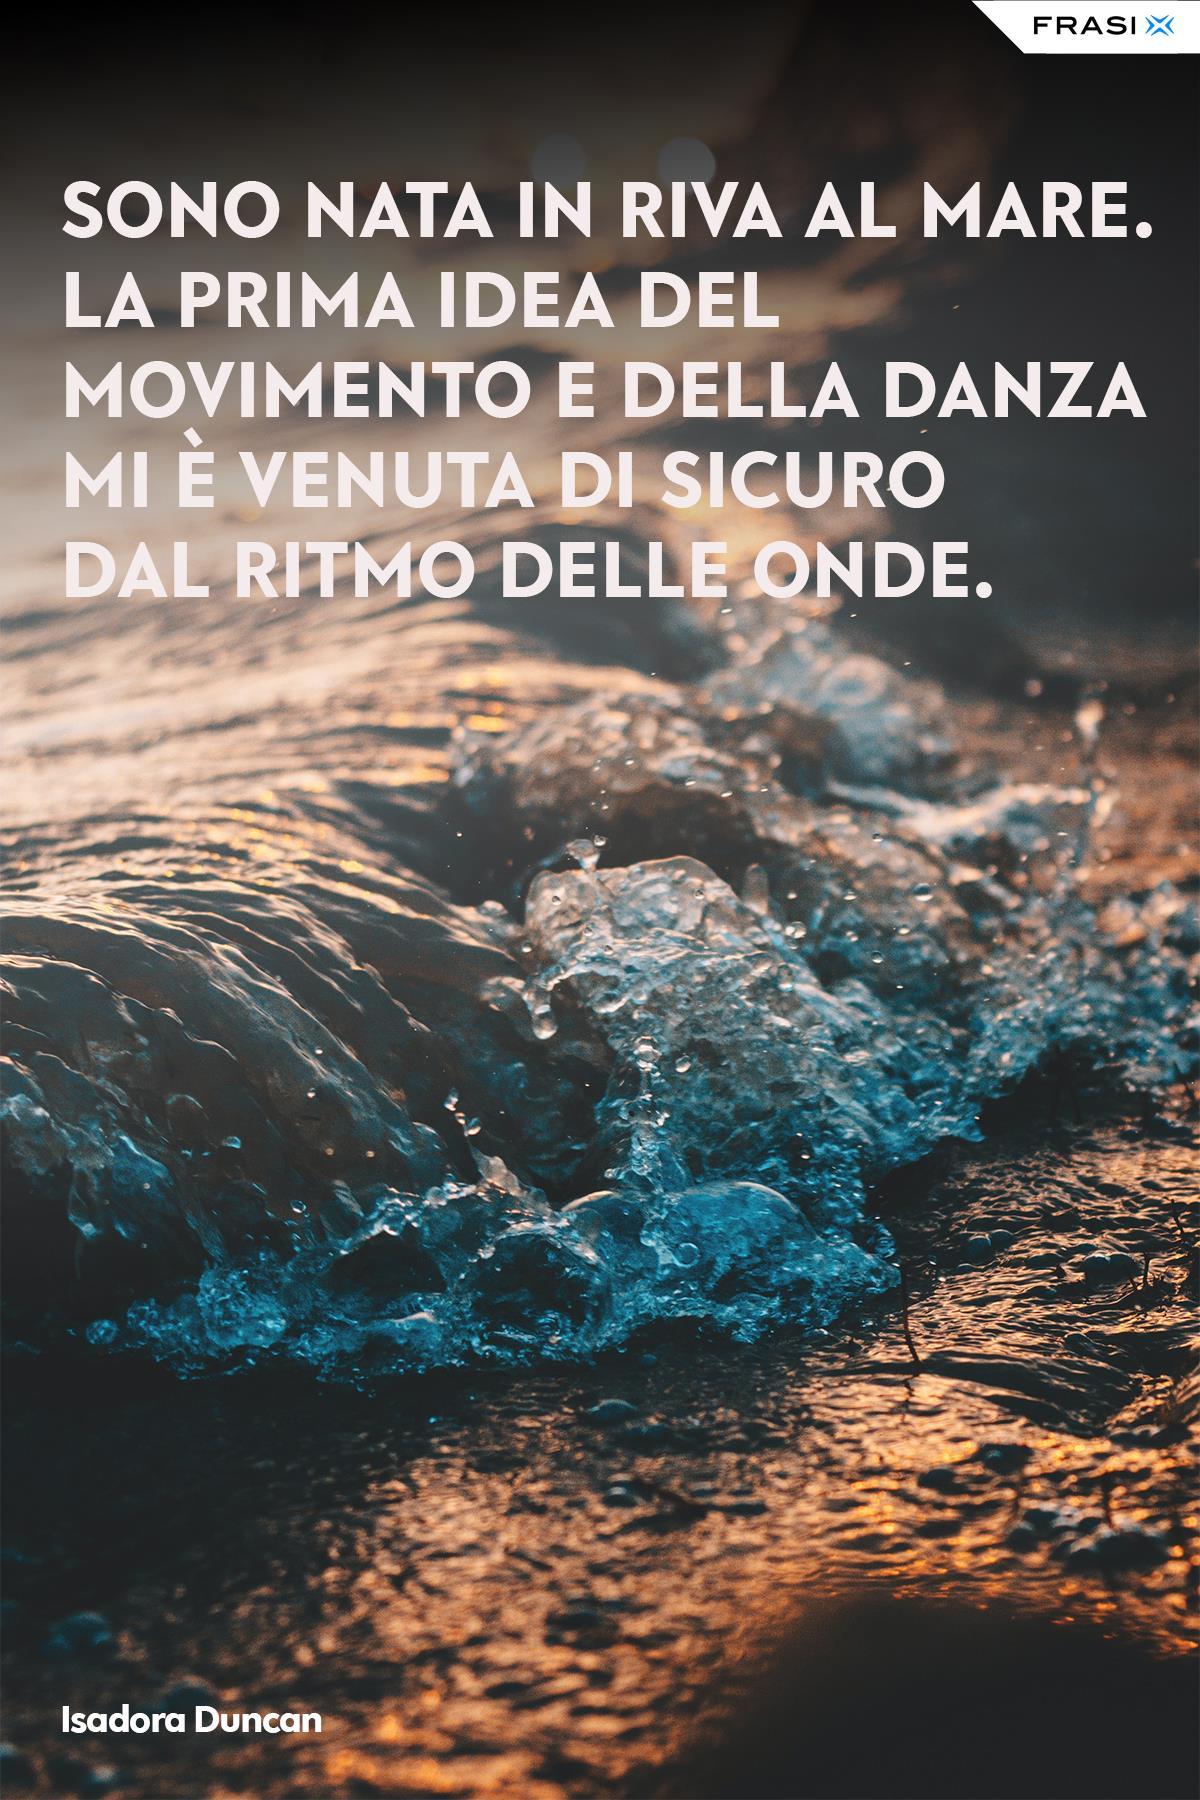 Frasi danza mare Isadora Duncan